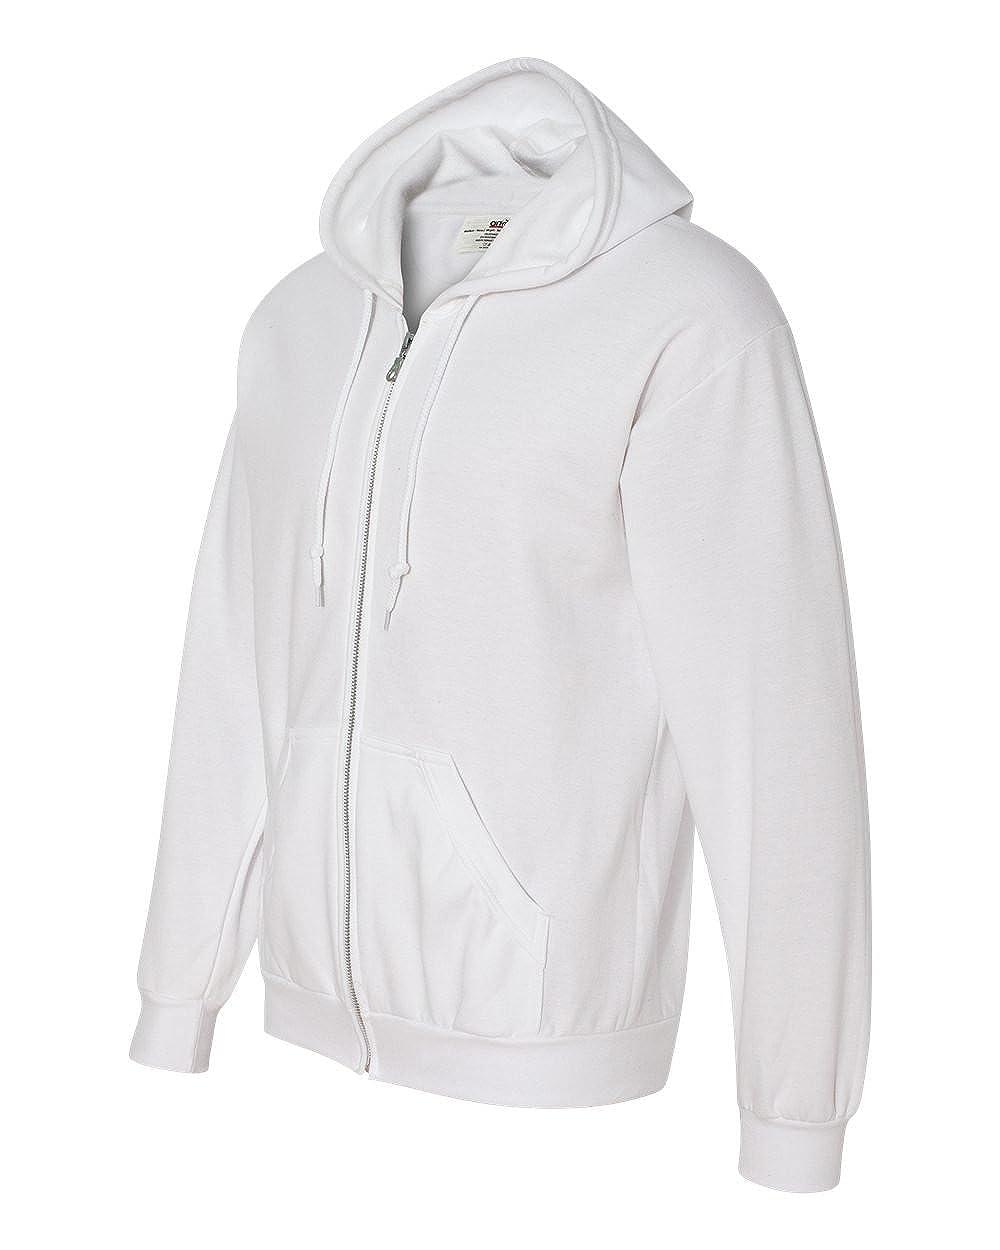 White 3XL Clementine Mens Combed Ringspun Fashion Fleece Full-Zip Hood 71600